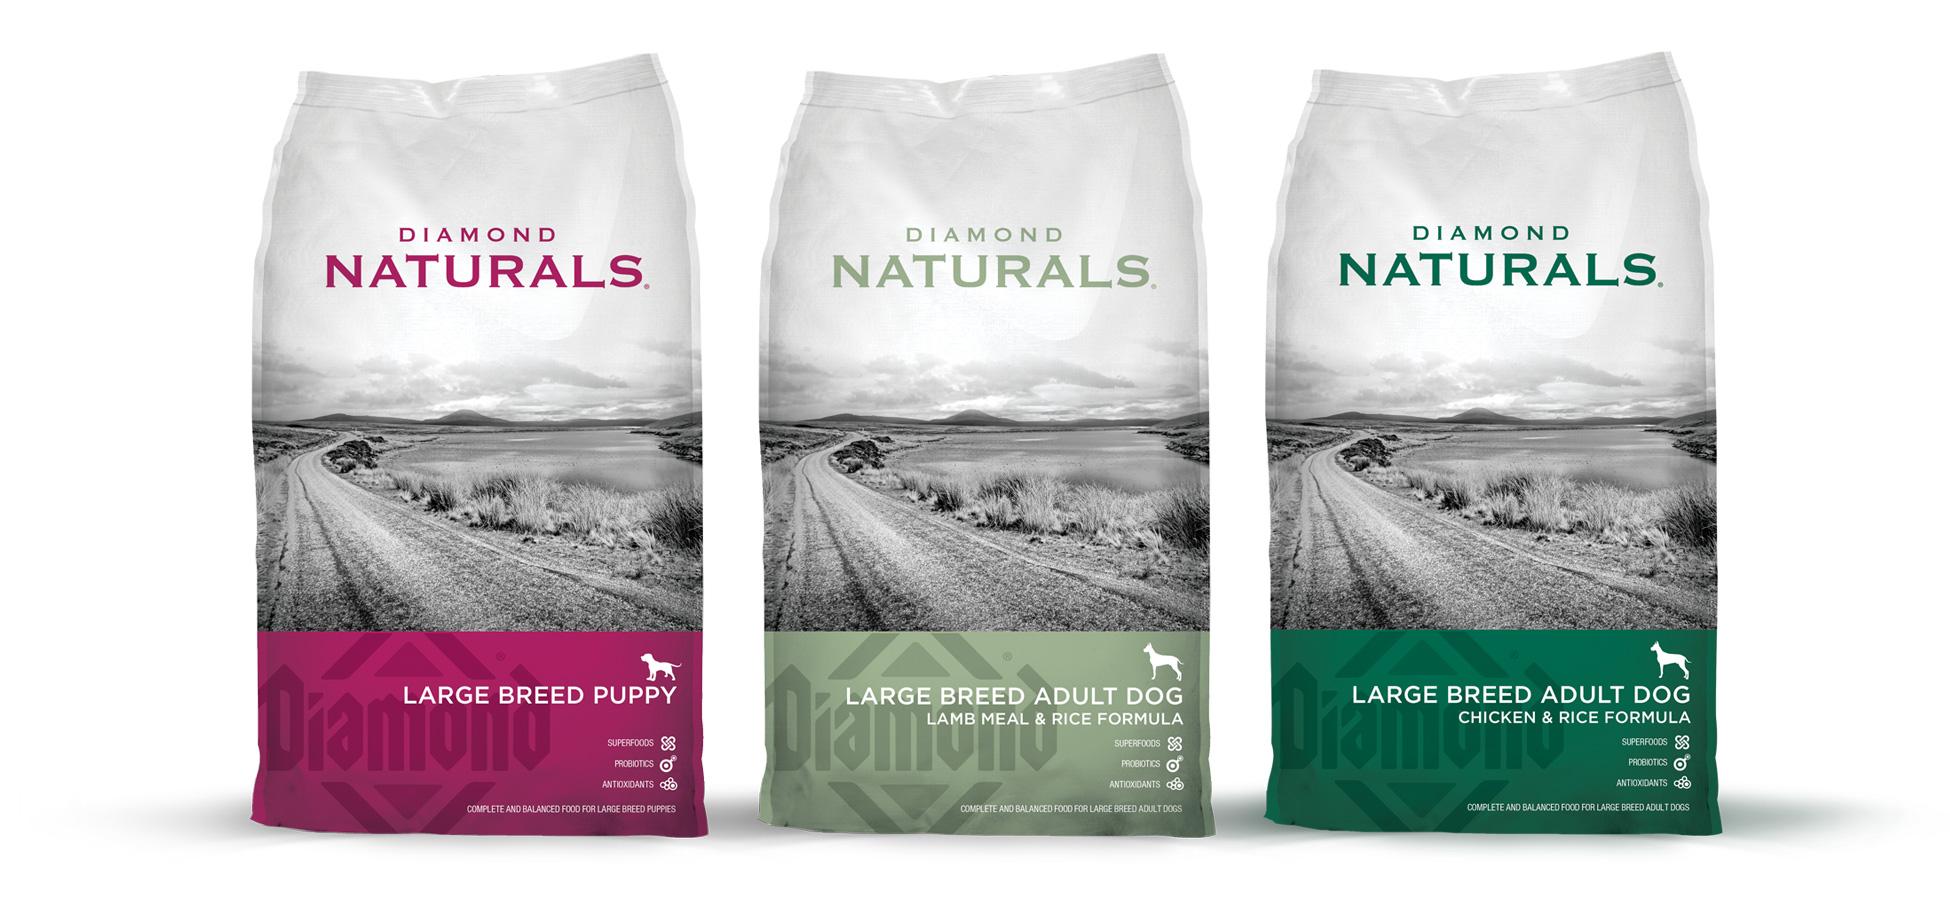 Diamond Naturals Dog Food Retailers